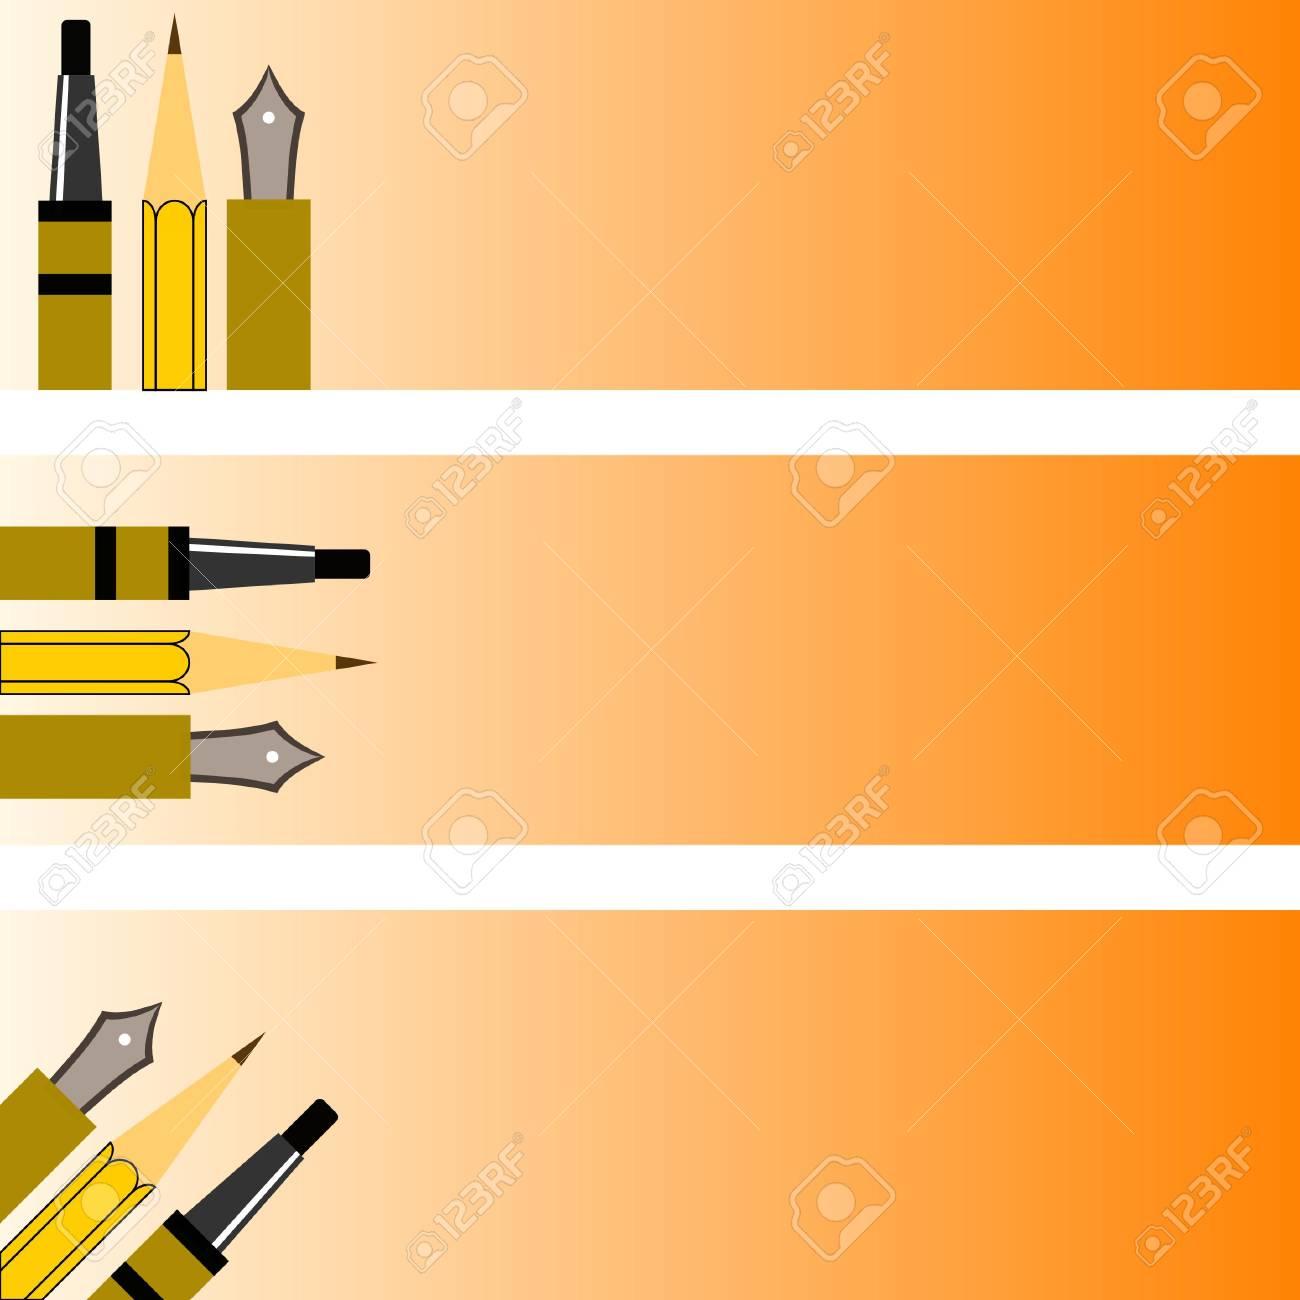 banner pens Stock Vector - 3303014